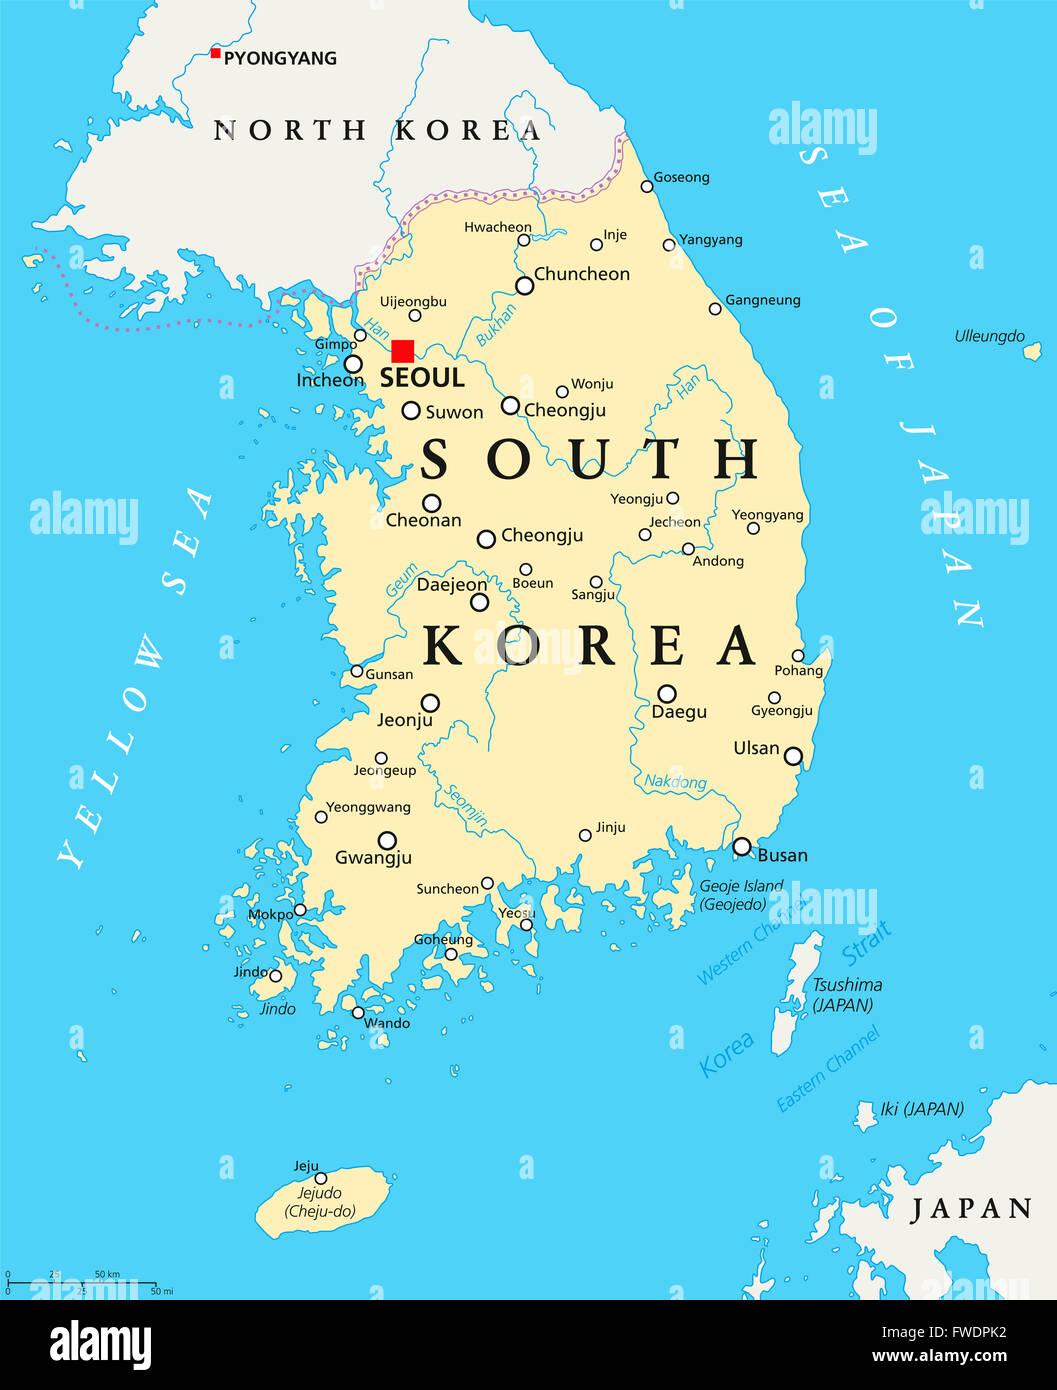 South Korea political map with capital Seoul, national borders